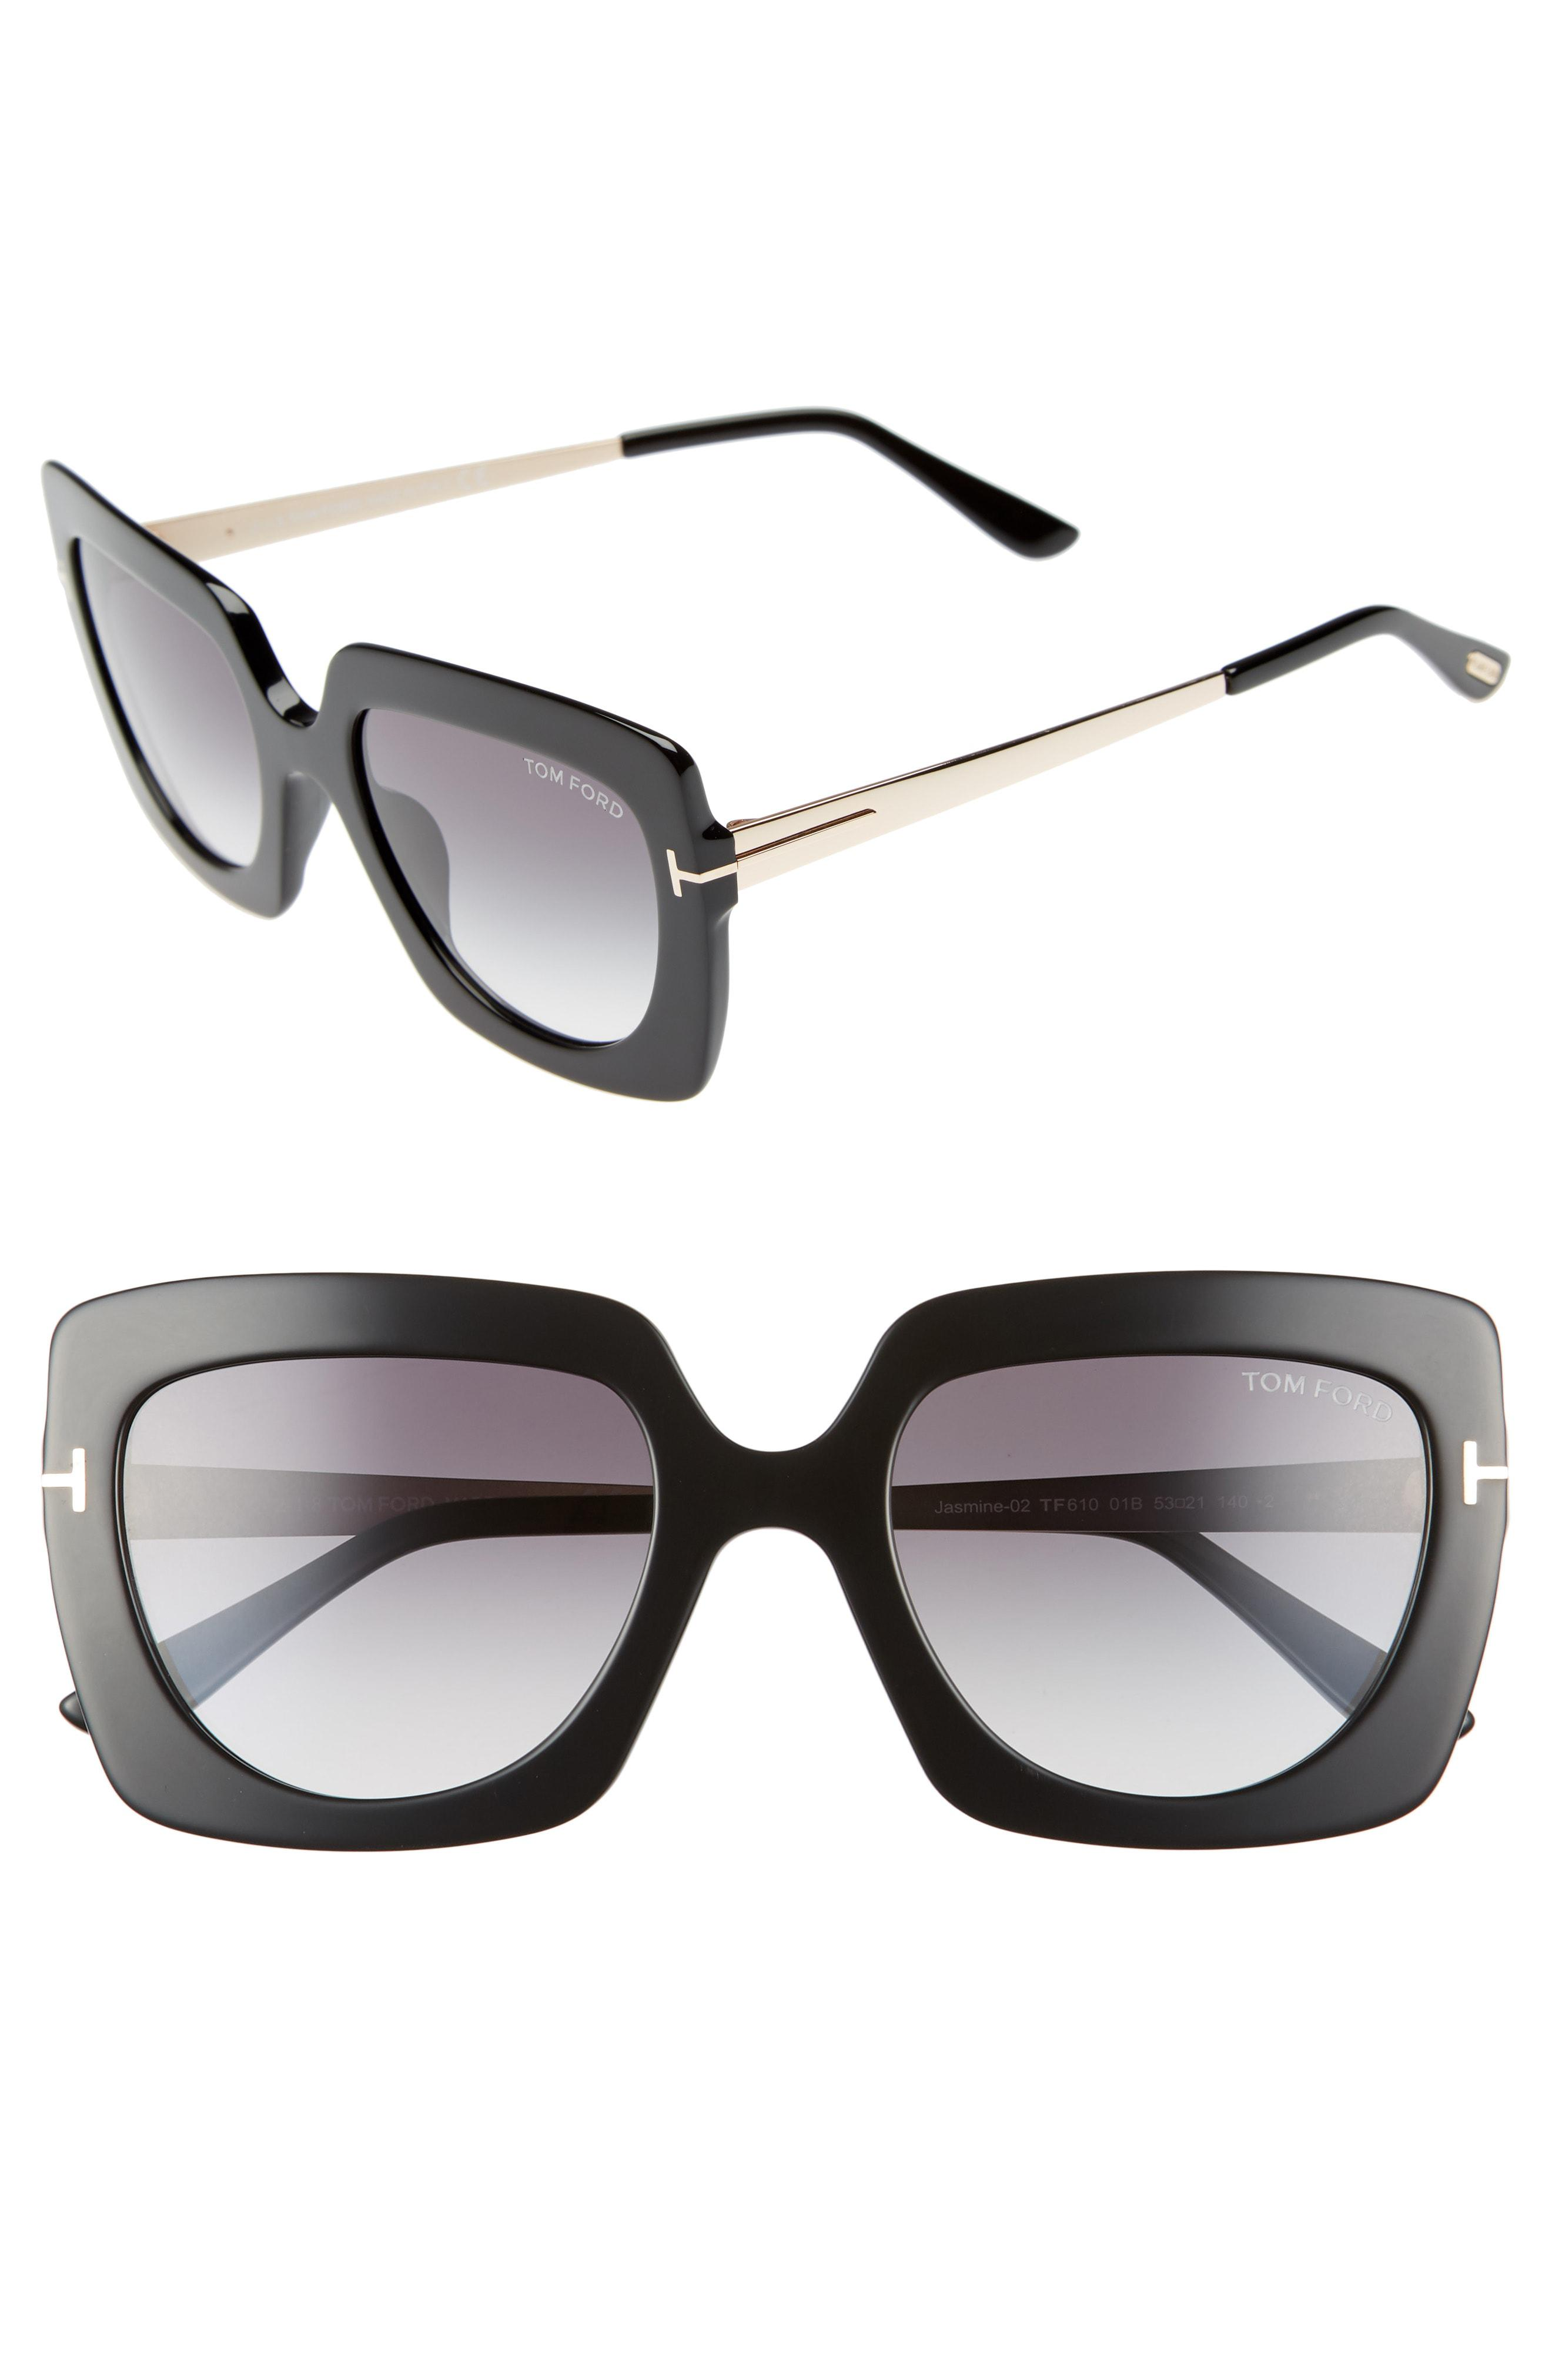 acbbf80544 Lyst - Tom Ford Jasmine 53mm Sunglasses - Shiny Black  Gradient ...